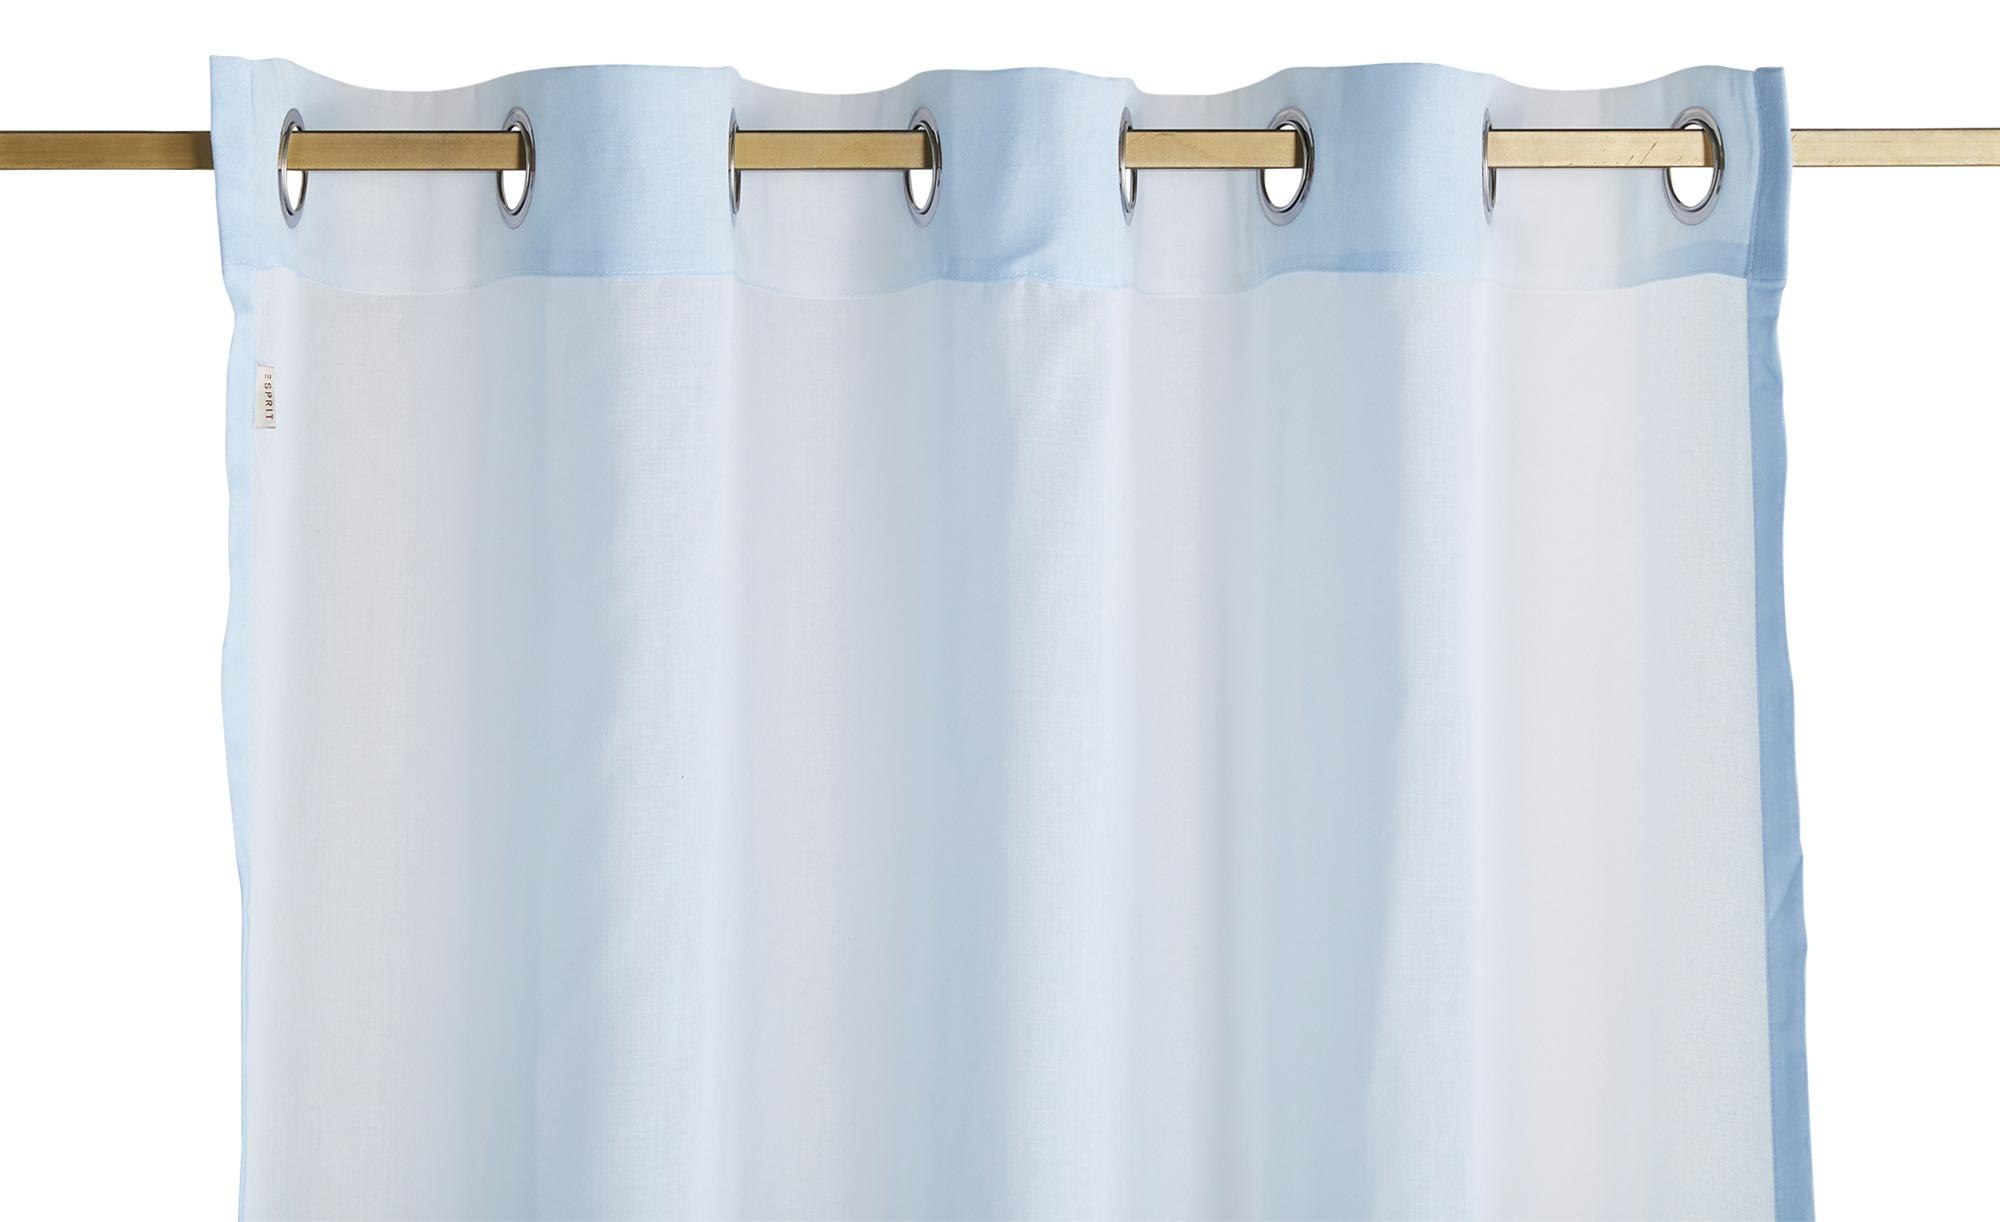 Esprit Ösenschal  E-Vel ¦ blau ¦ 100% Polyester ¦ Maße (cm): B: 140 Gardinen & Vorhänge > Gardinen & Fertigstore > Ösenschals - Höffner